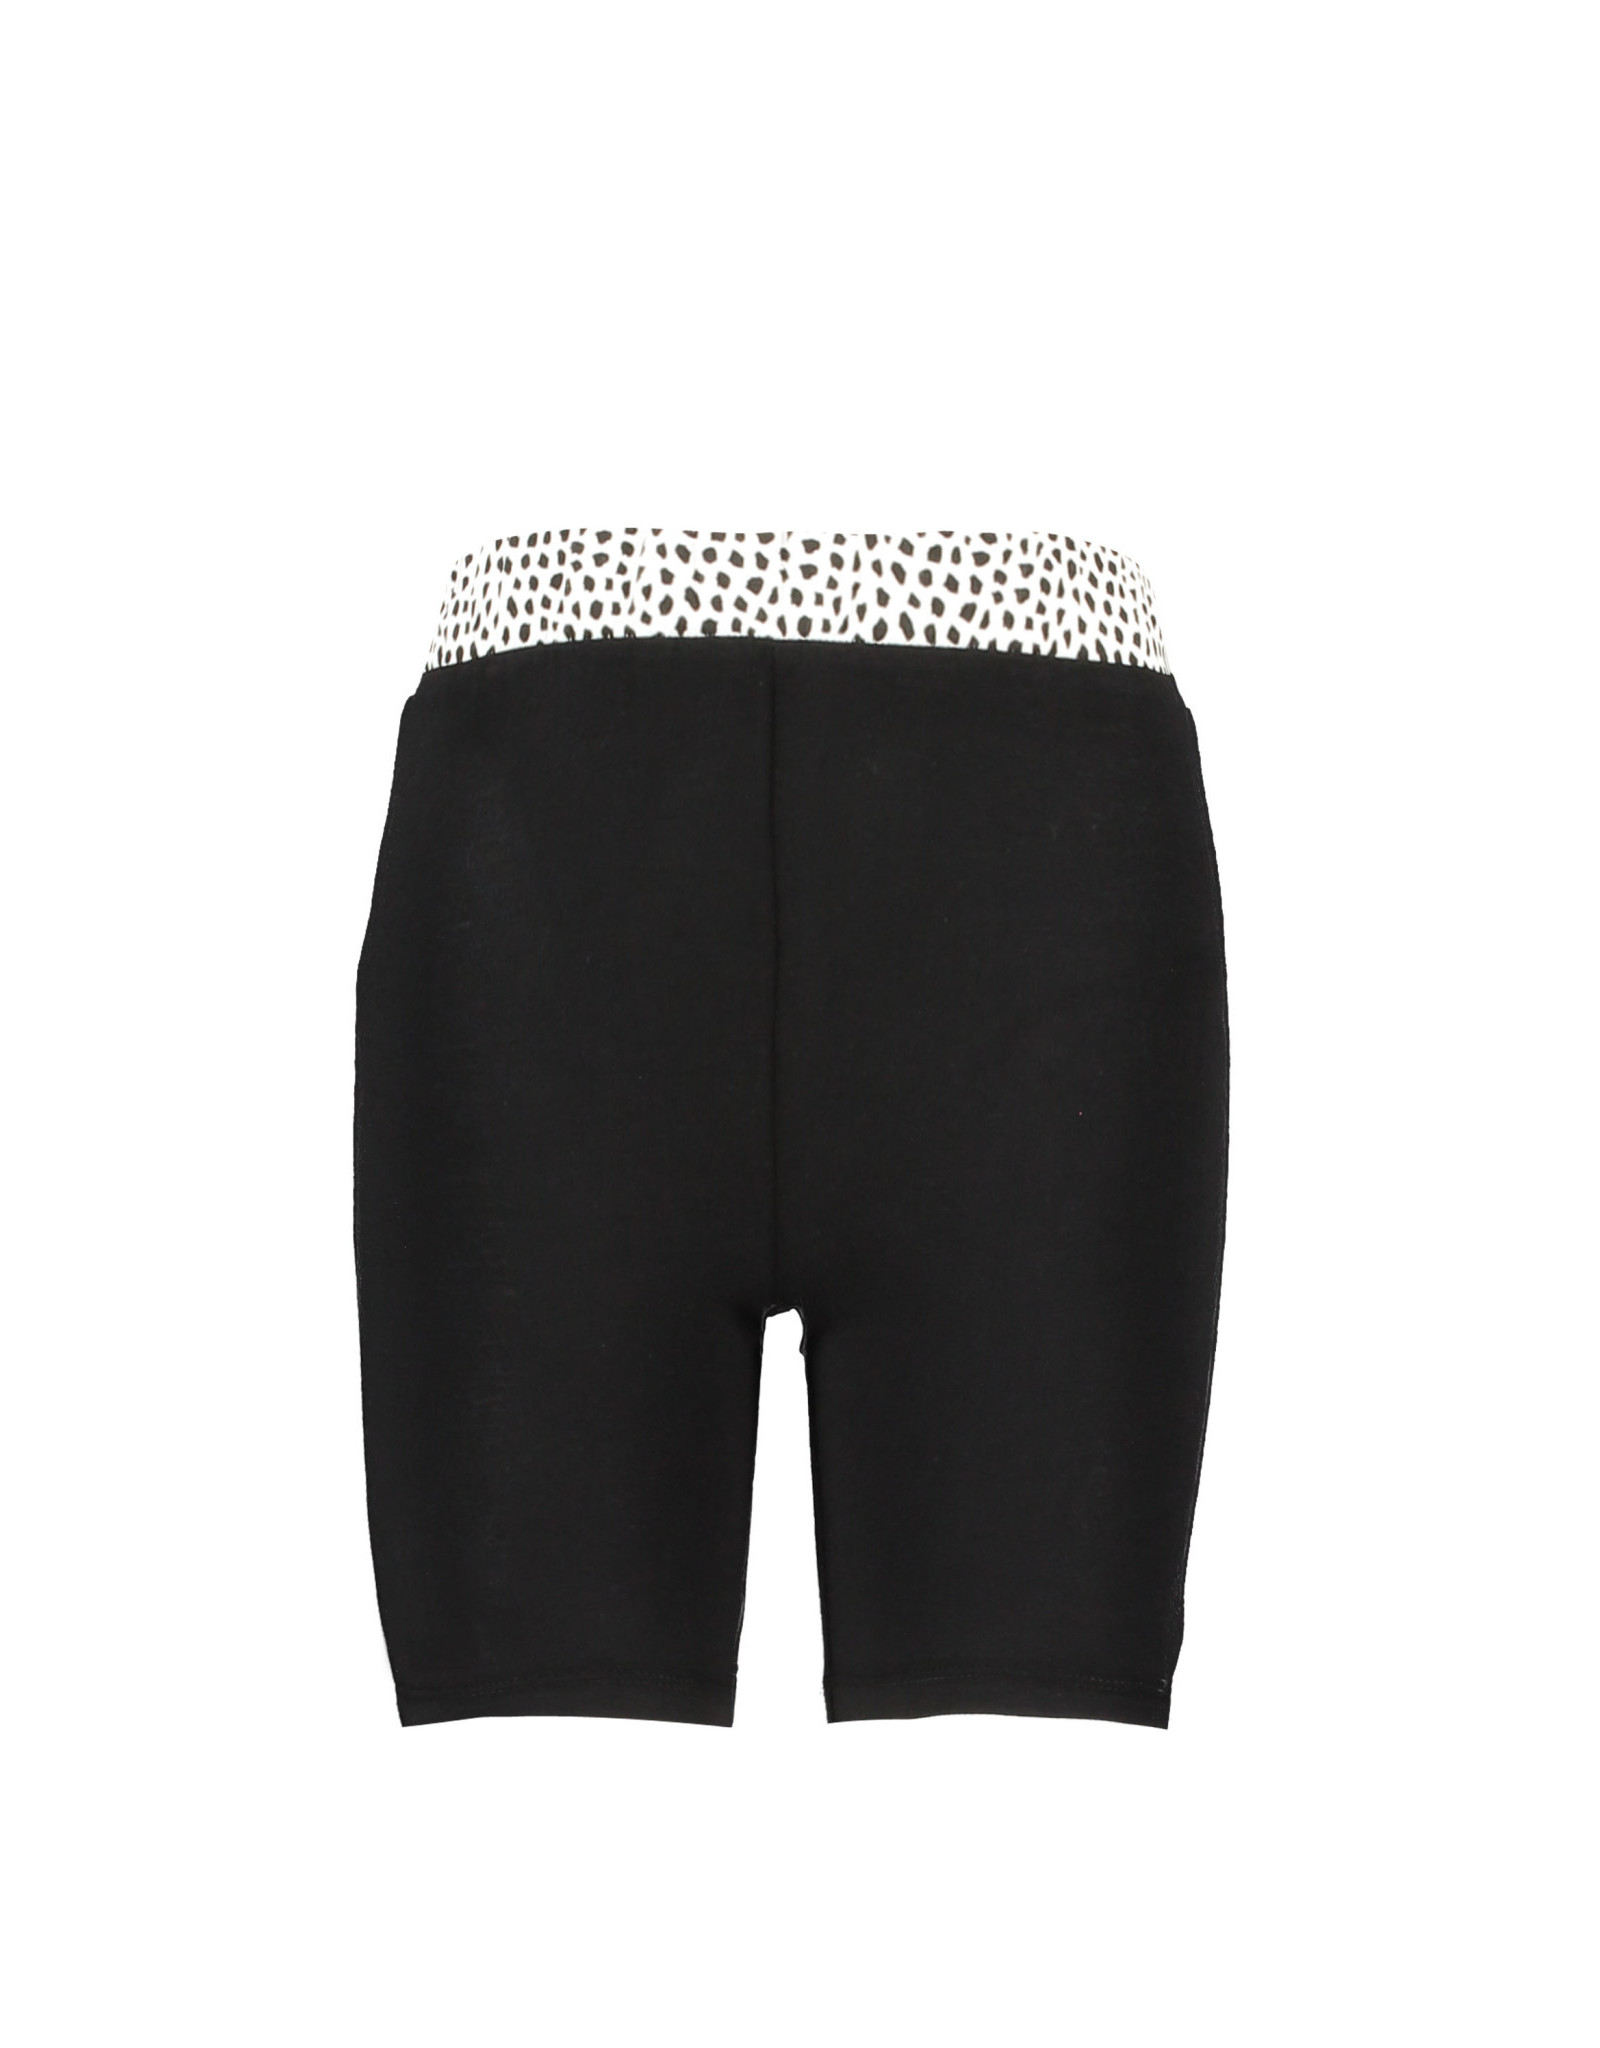 B.Nosy B.Nosy meisjes korte broek met Fash Spots band Black